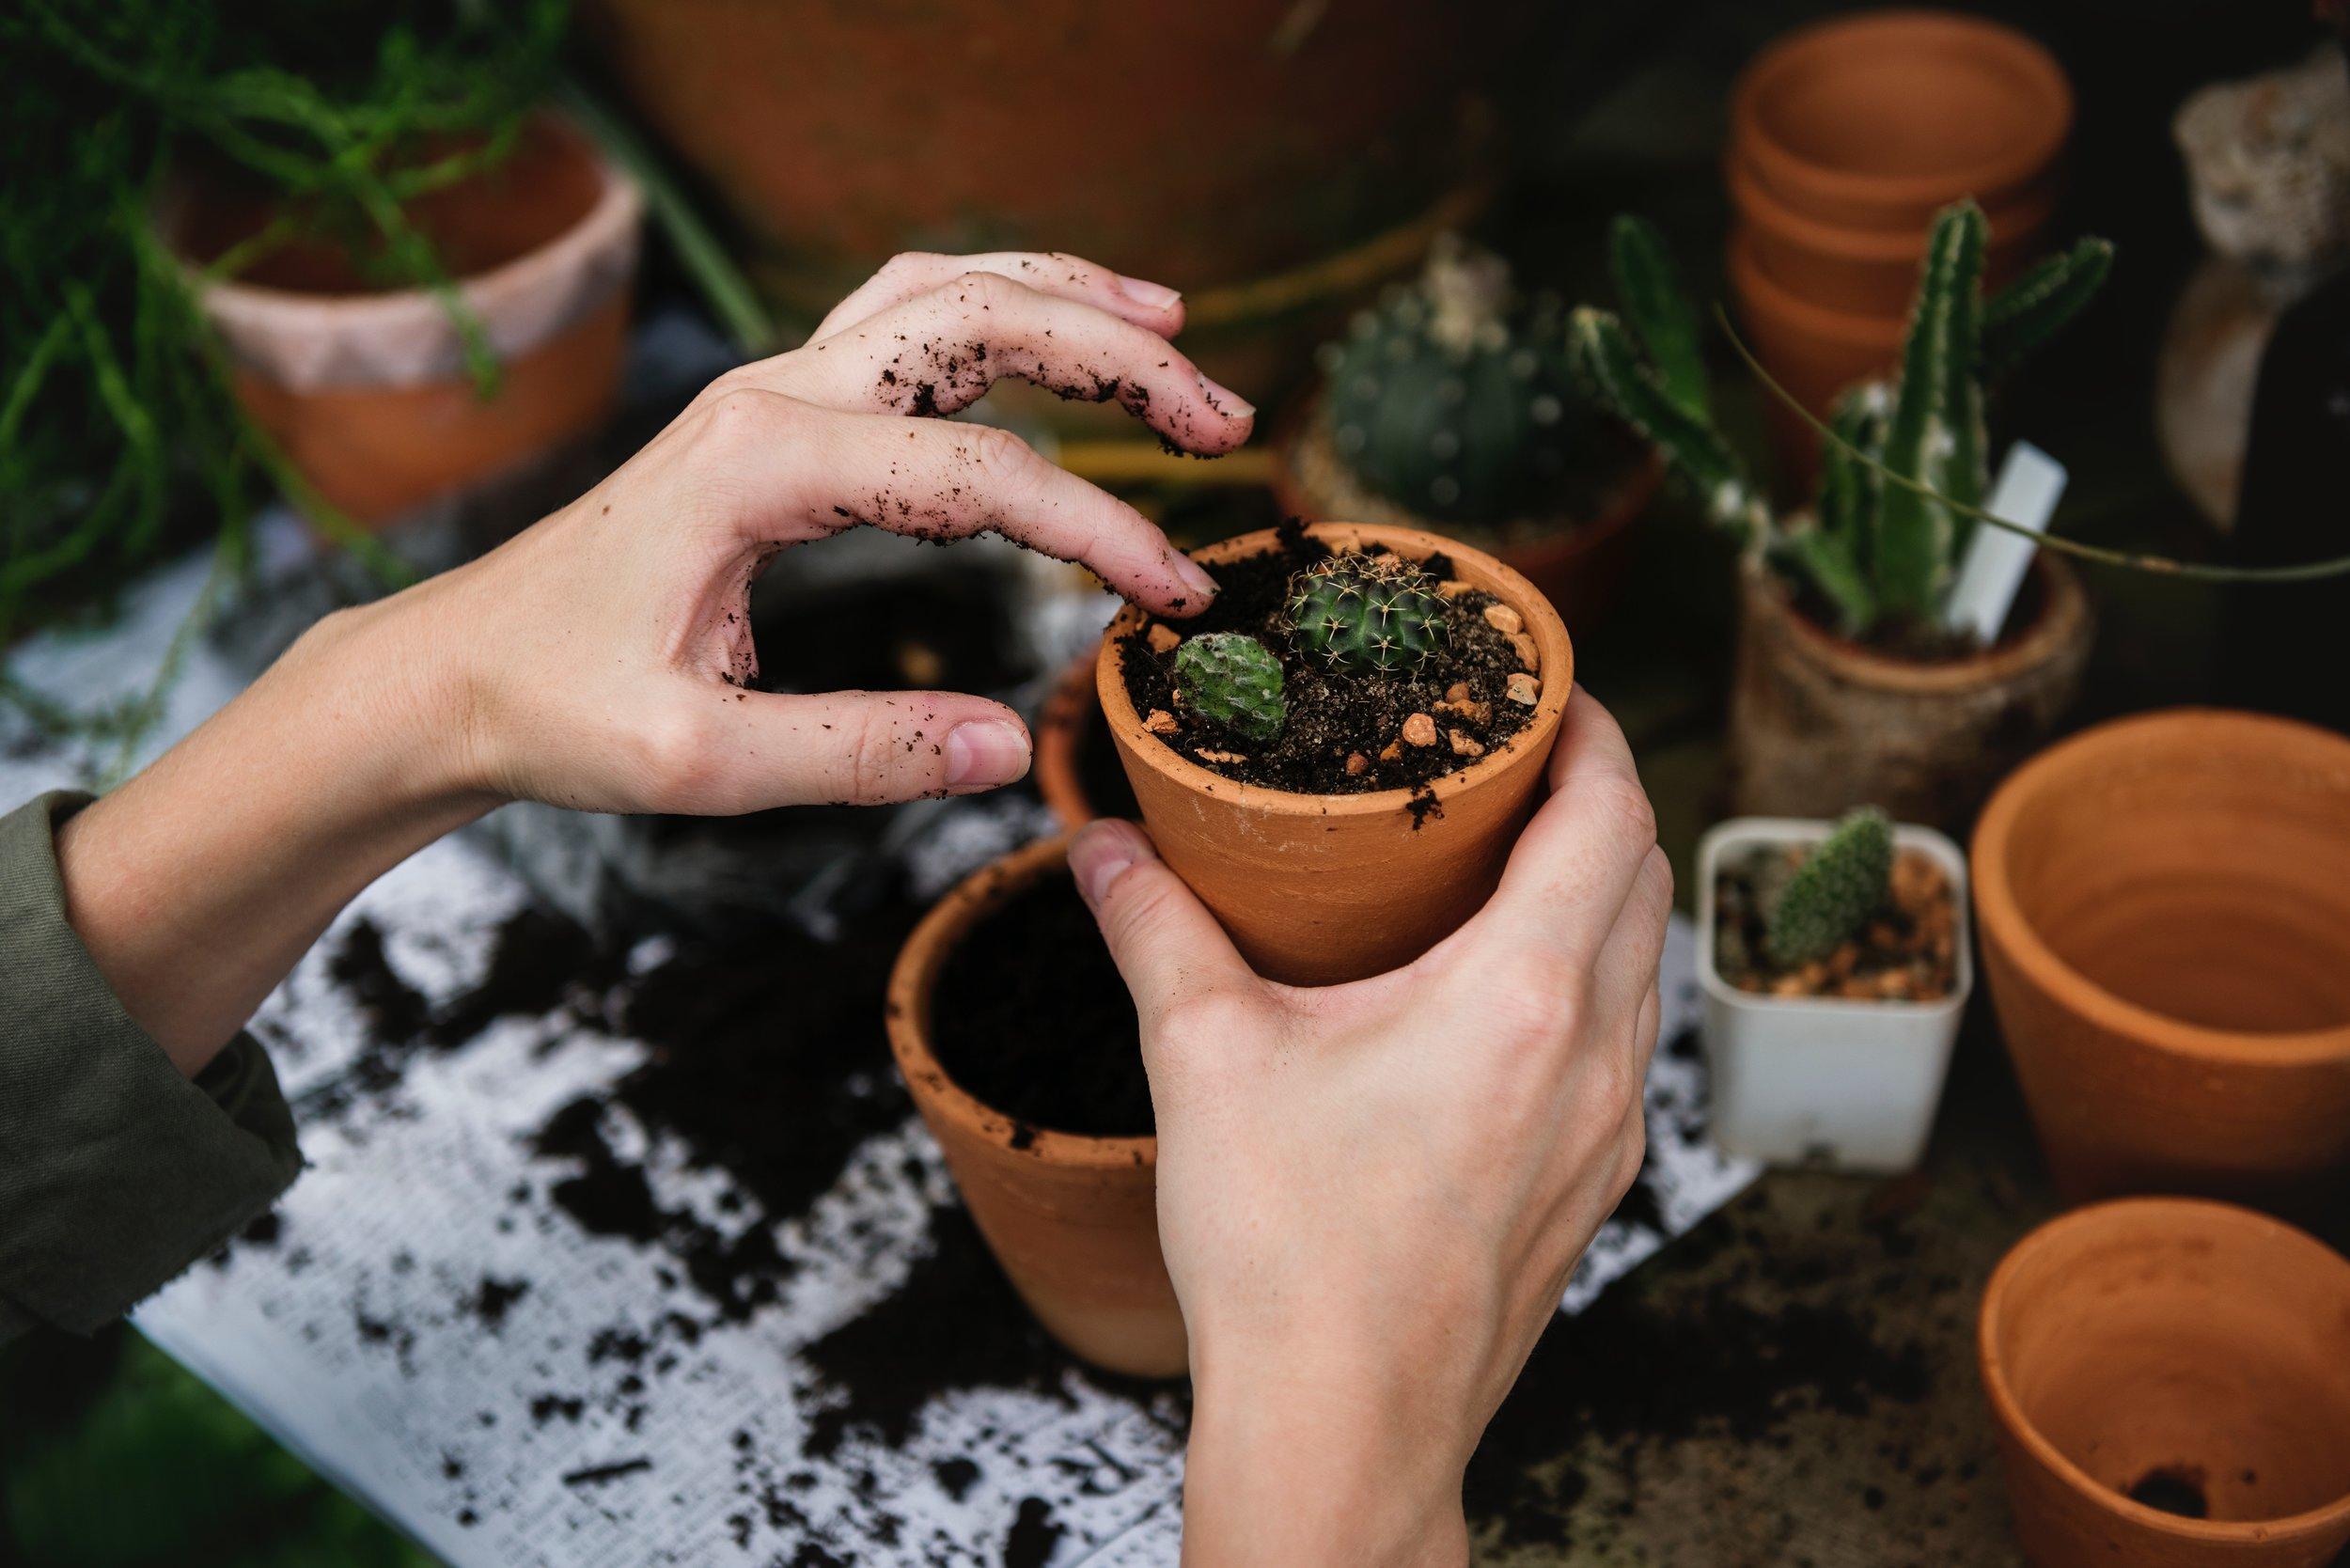 cacti-gardening-grow-707194.jpg